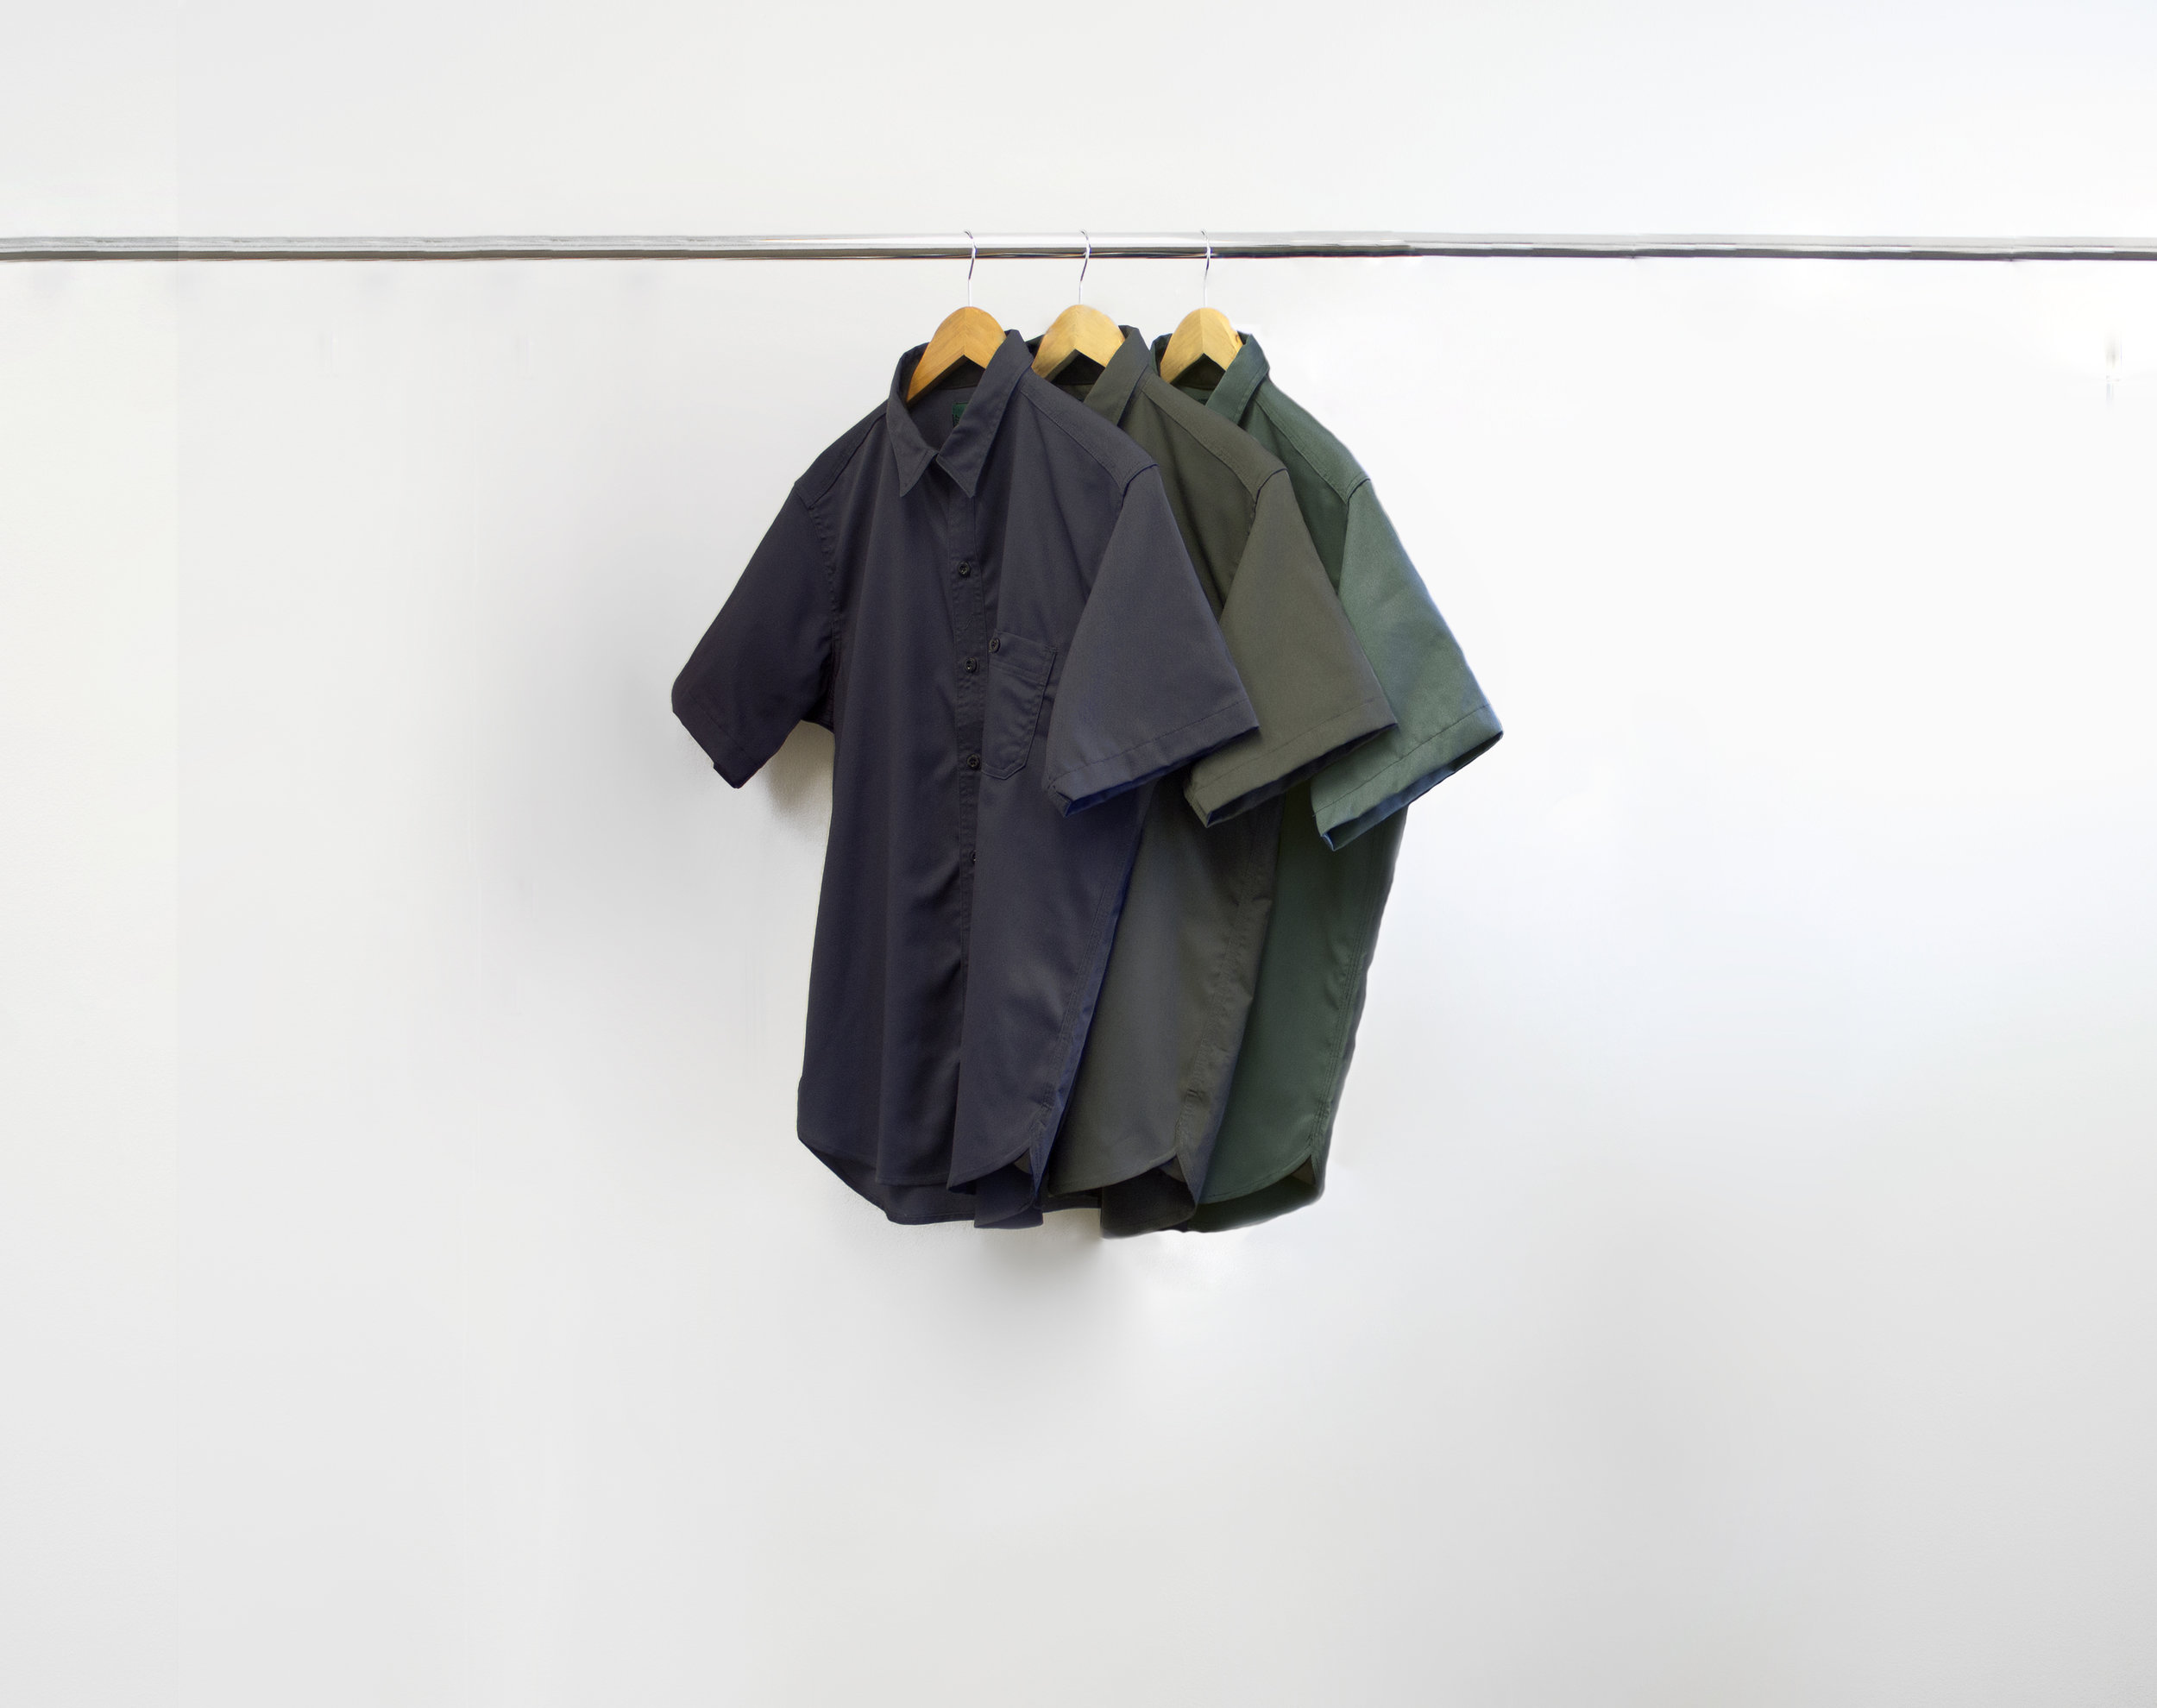 groupshot1justshirts-nobars.jpg